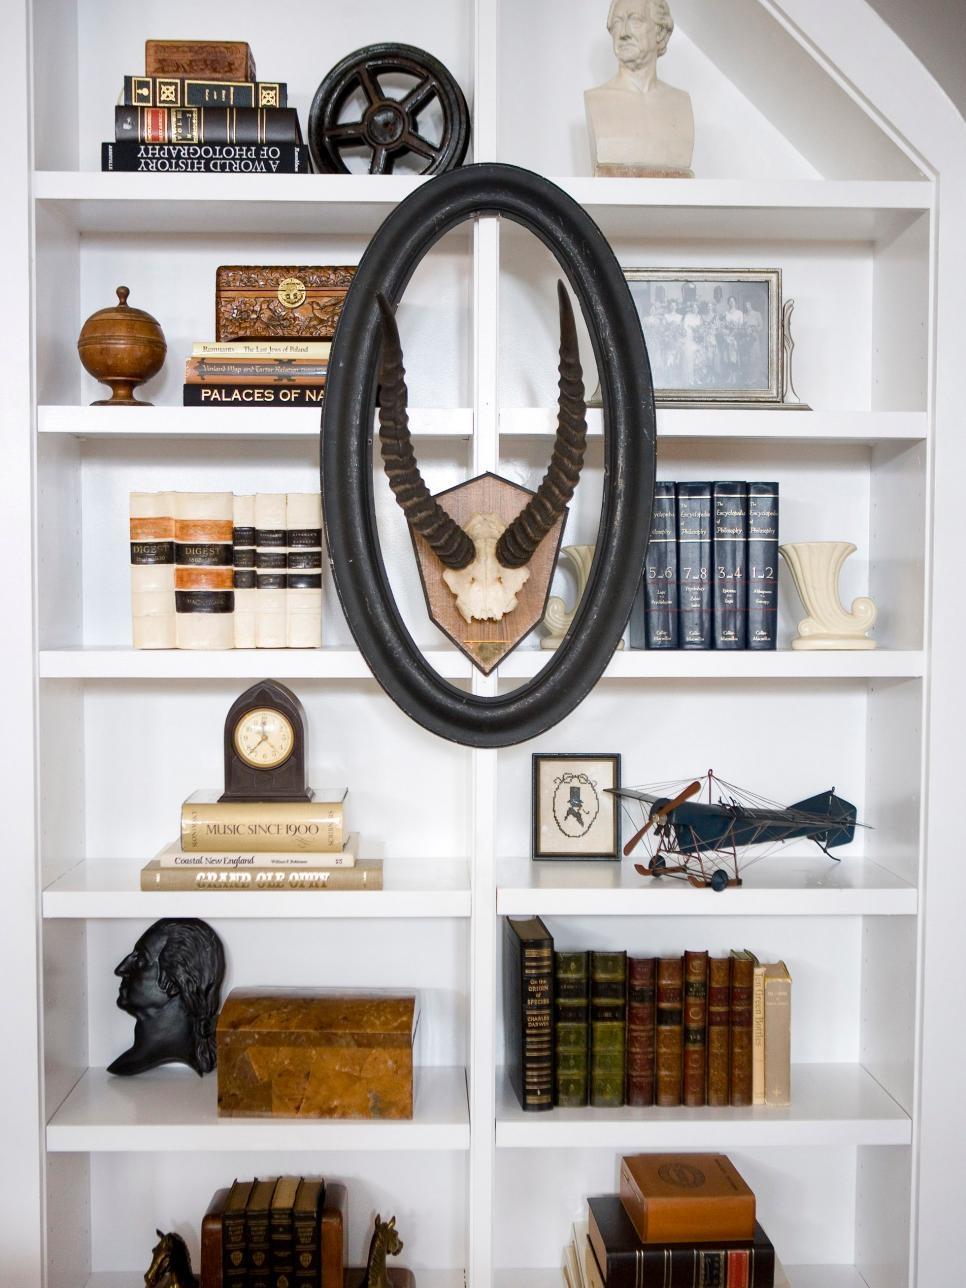 Bookshelf And Wall Shelf Decorating Ideas Hgtv Intended For Bookshelves Designs For Home (View 4 of 15)